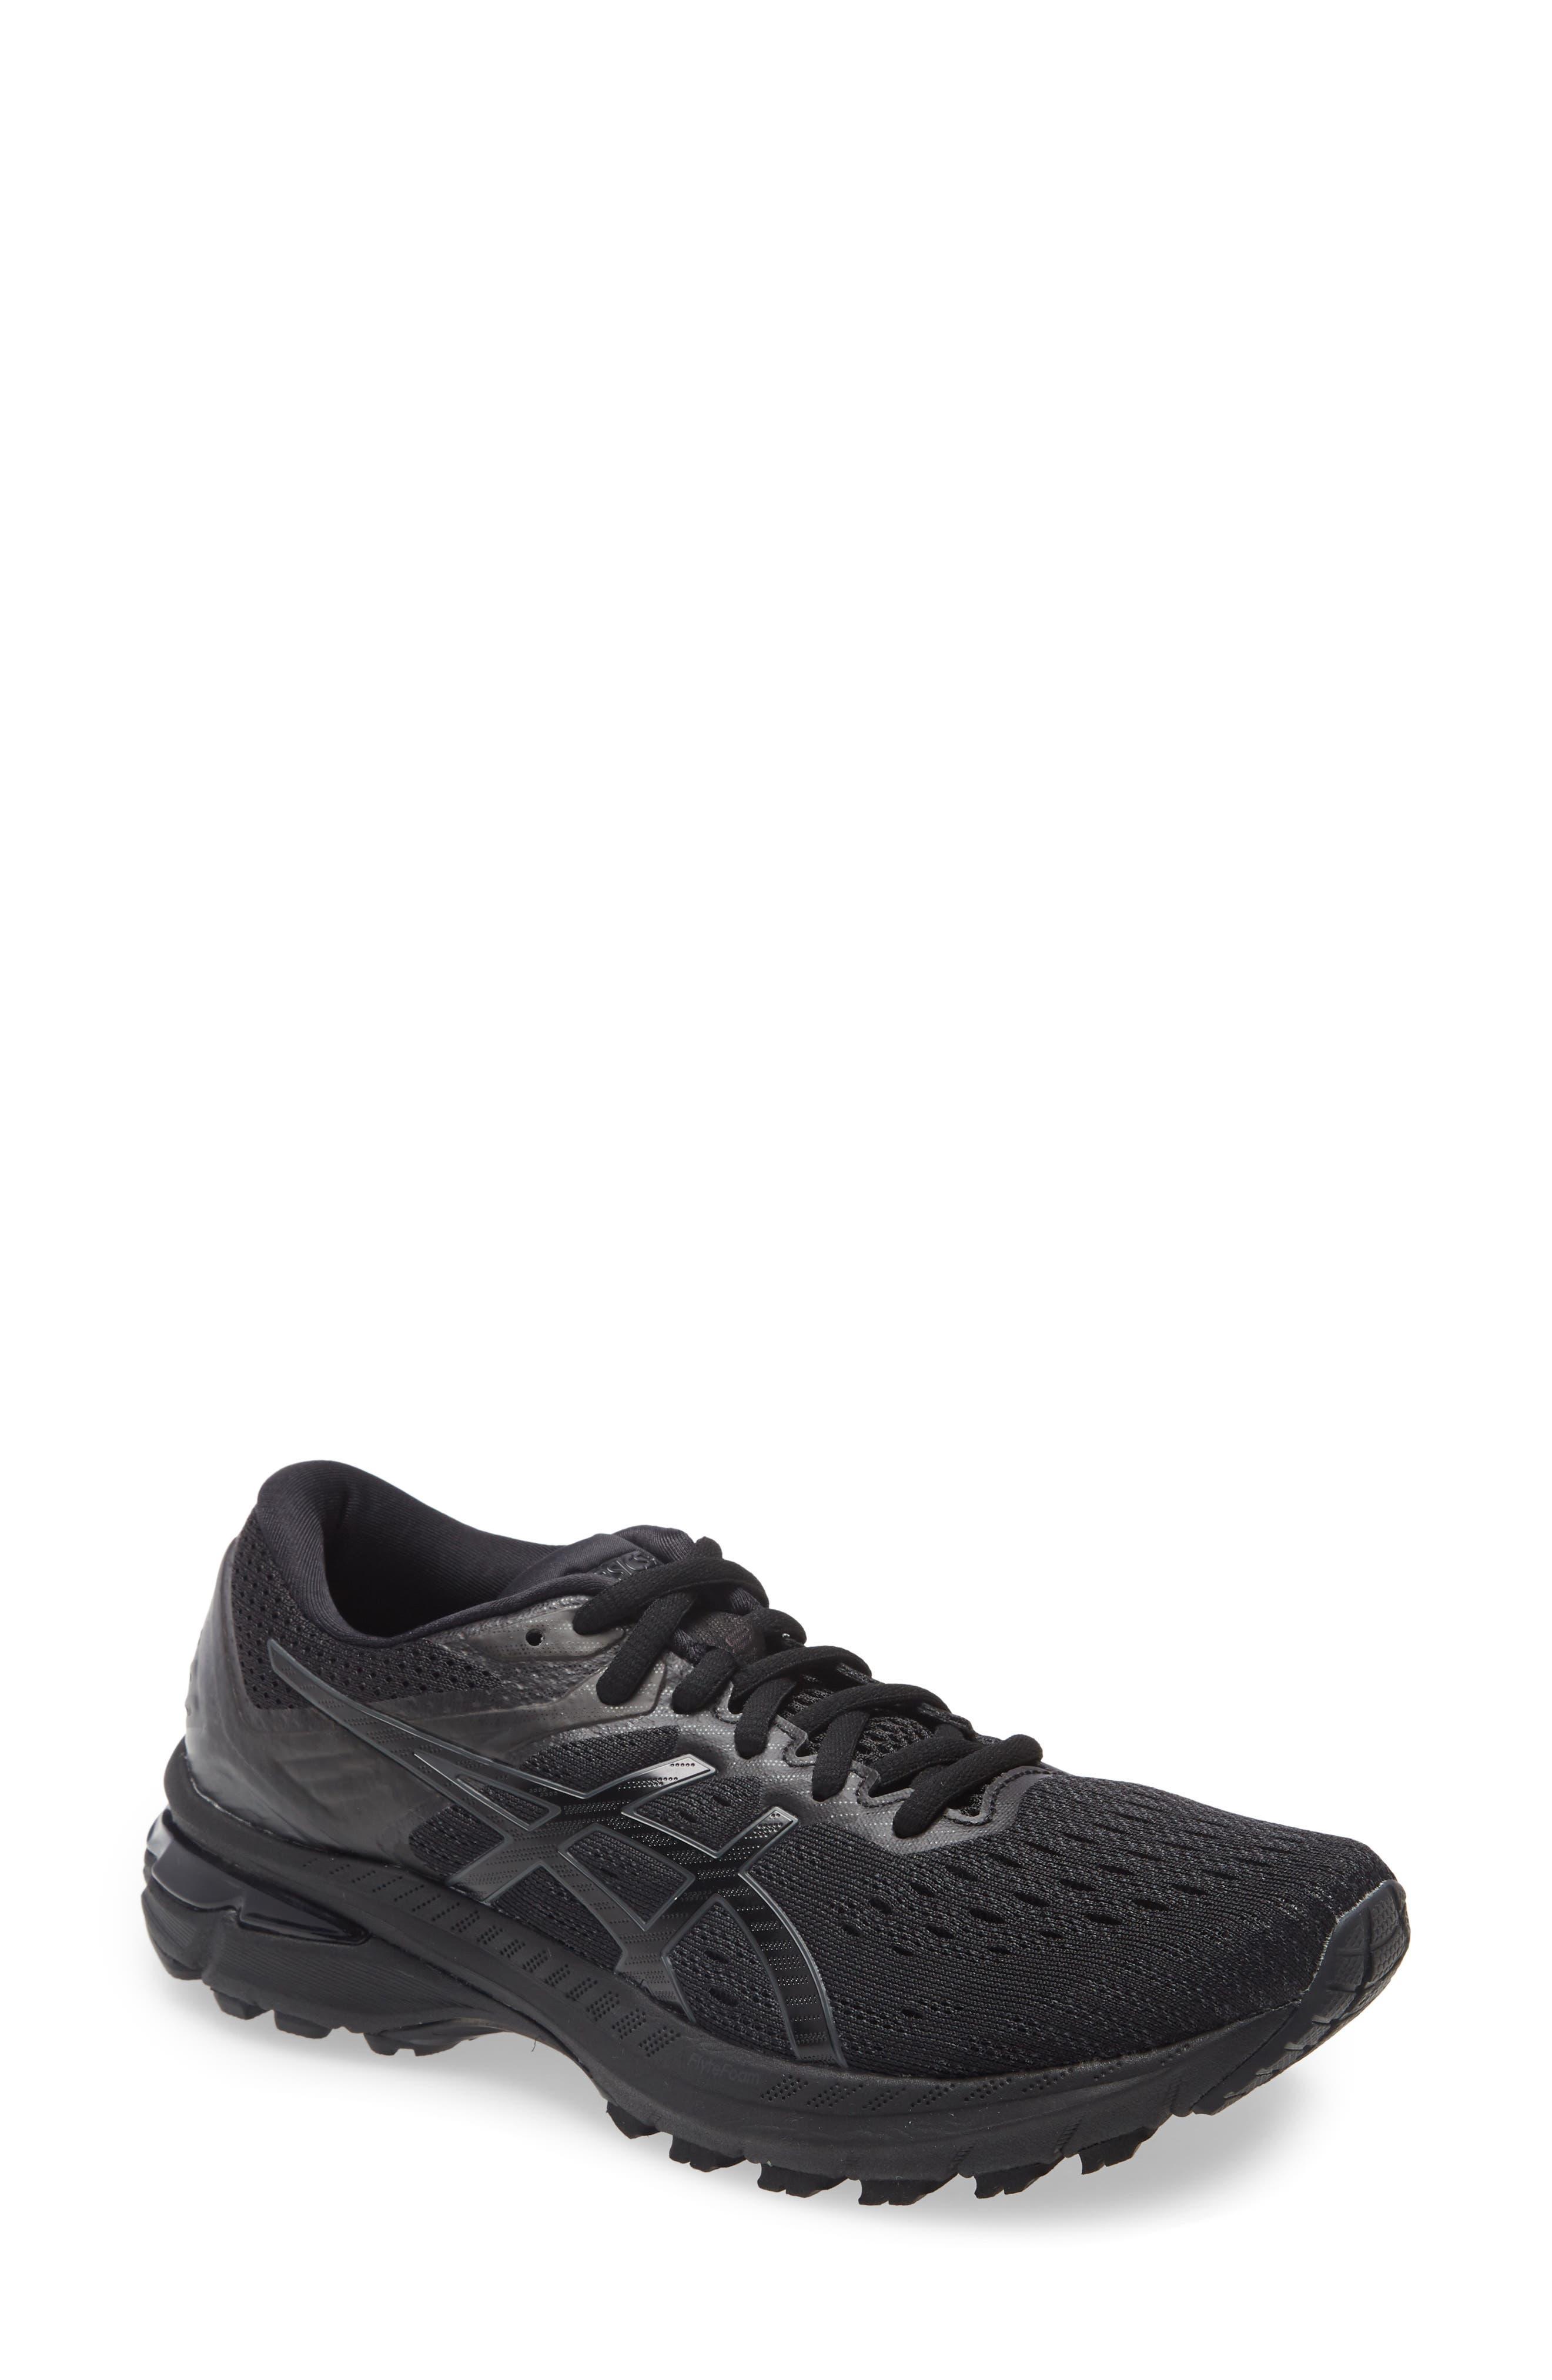 Women's Asics Gt-2000 9 Running Shoe